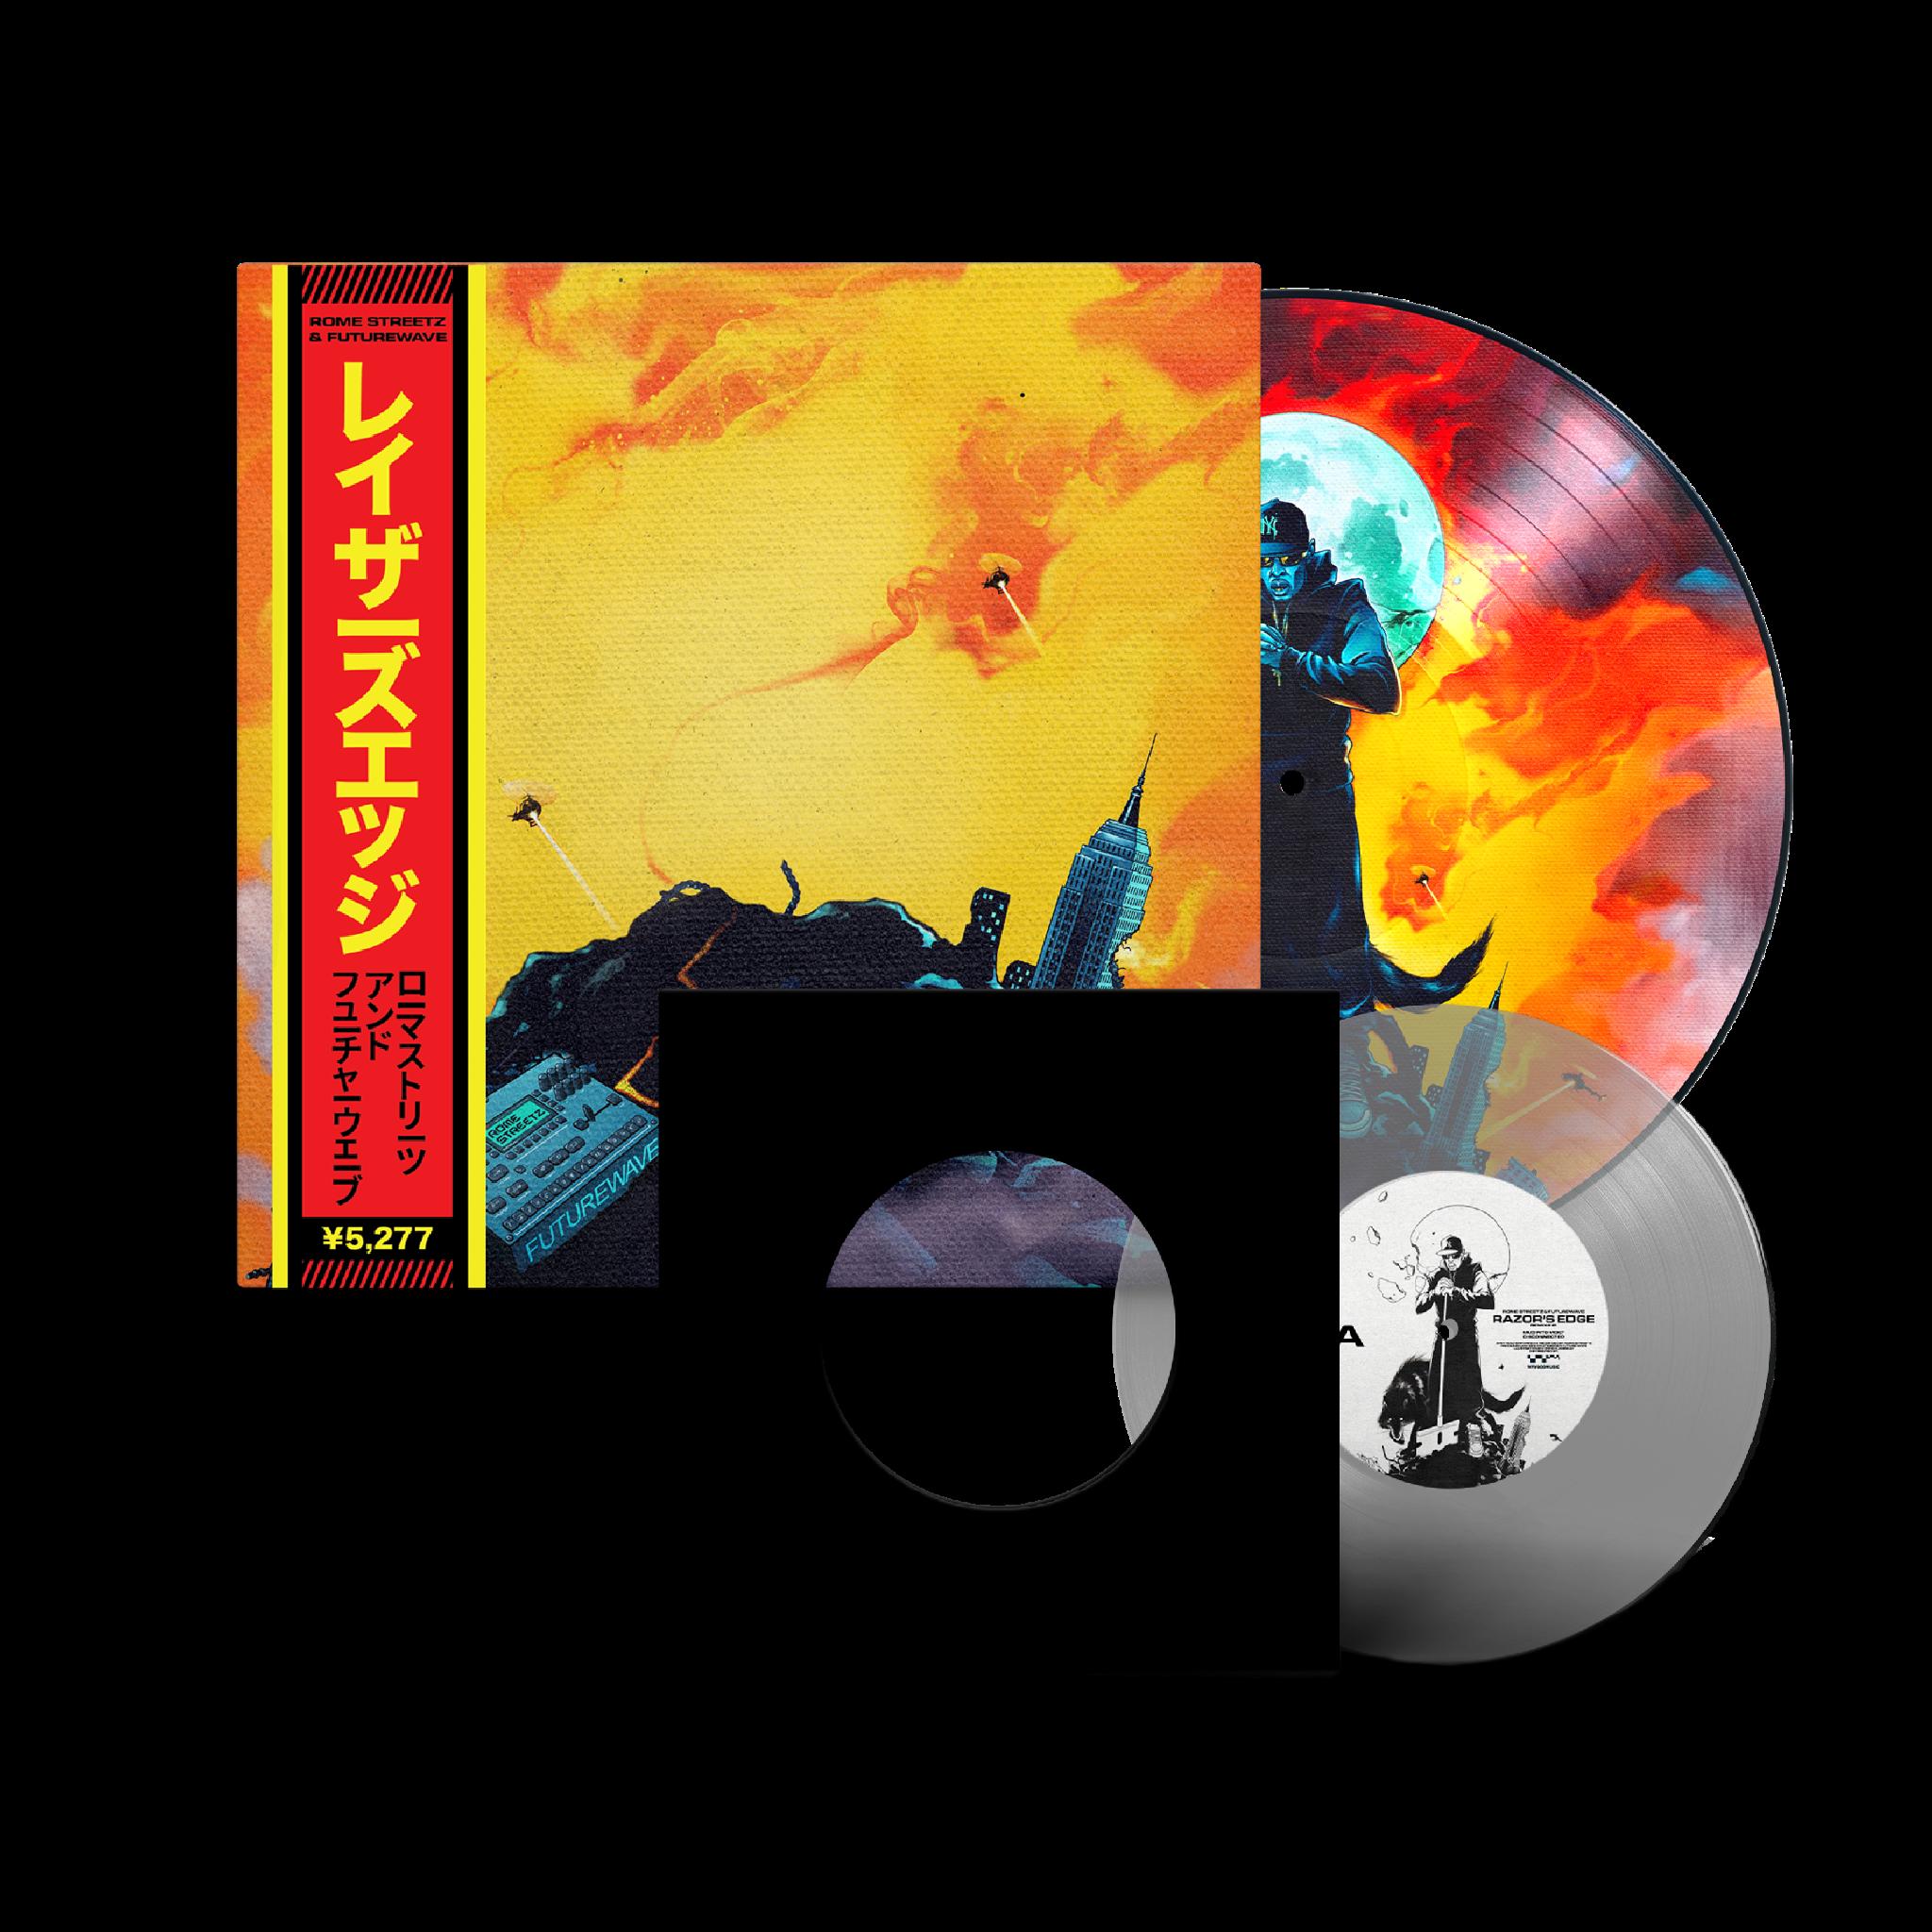 Rome Streetz, Futurewave - Razor's Edge LP